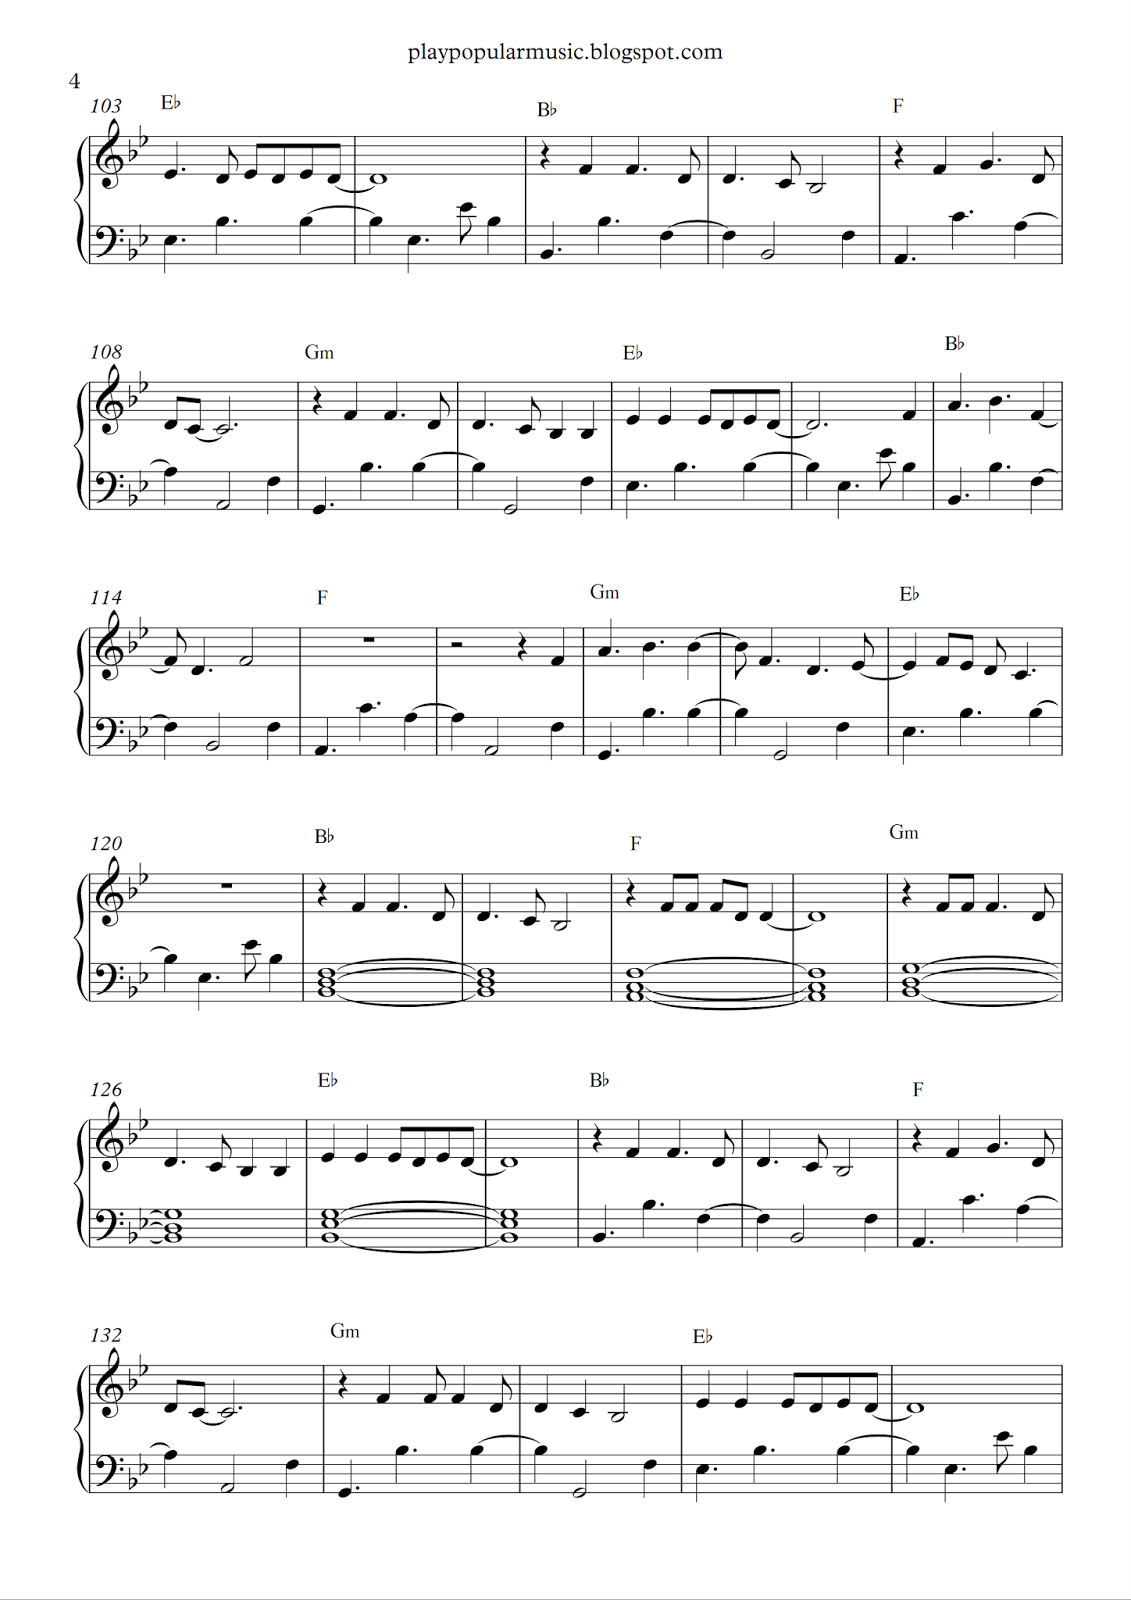 play popular music: Say You Won't Let Go - James Arthur